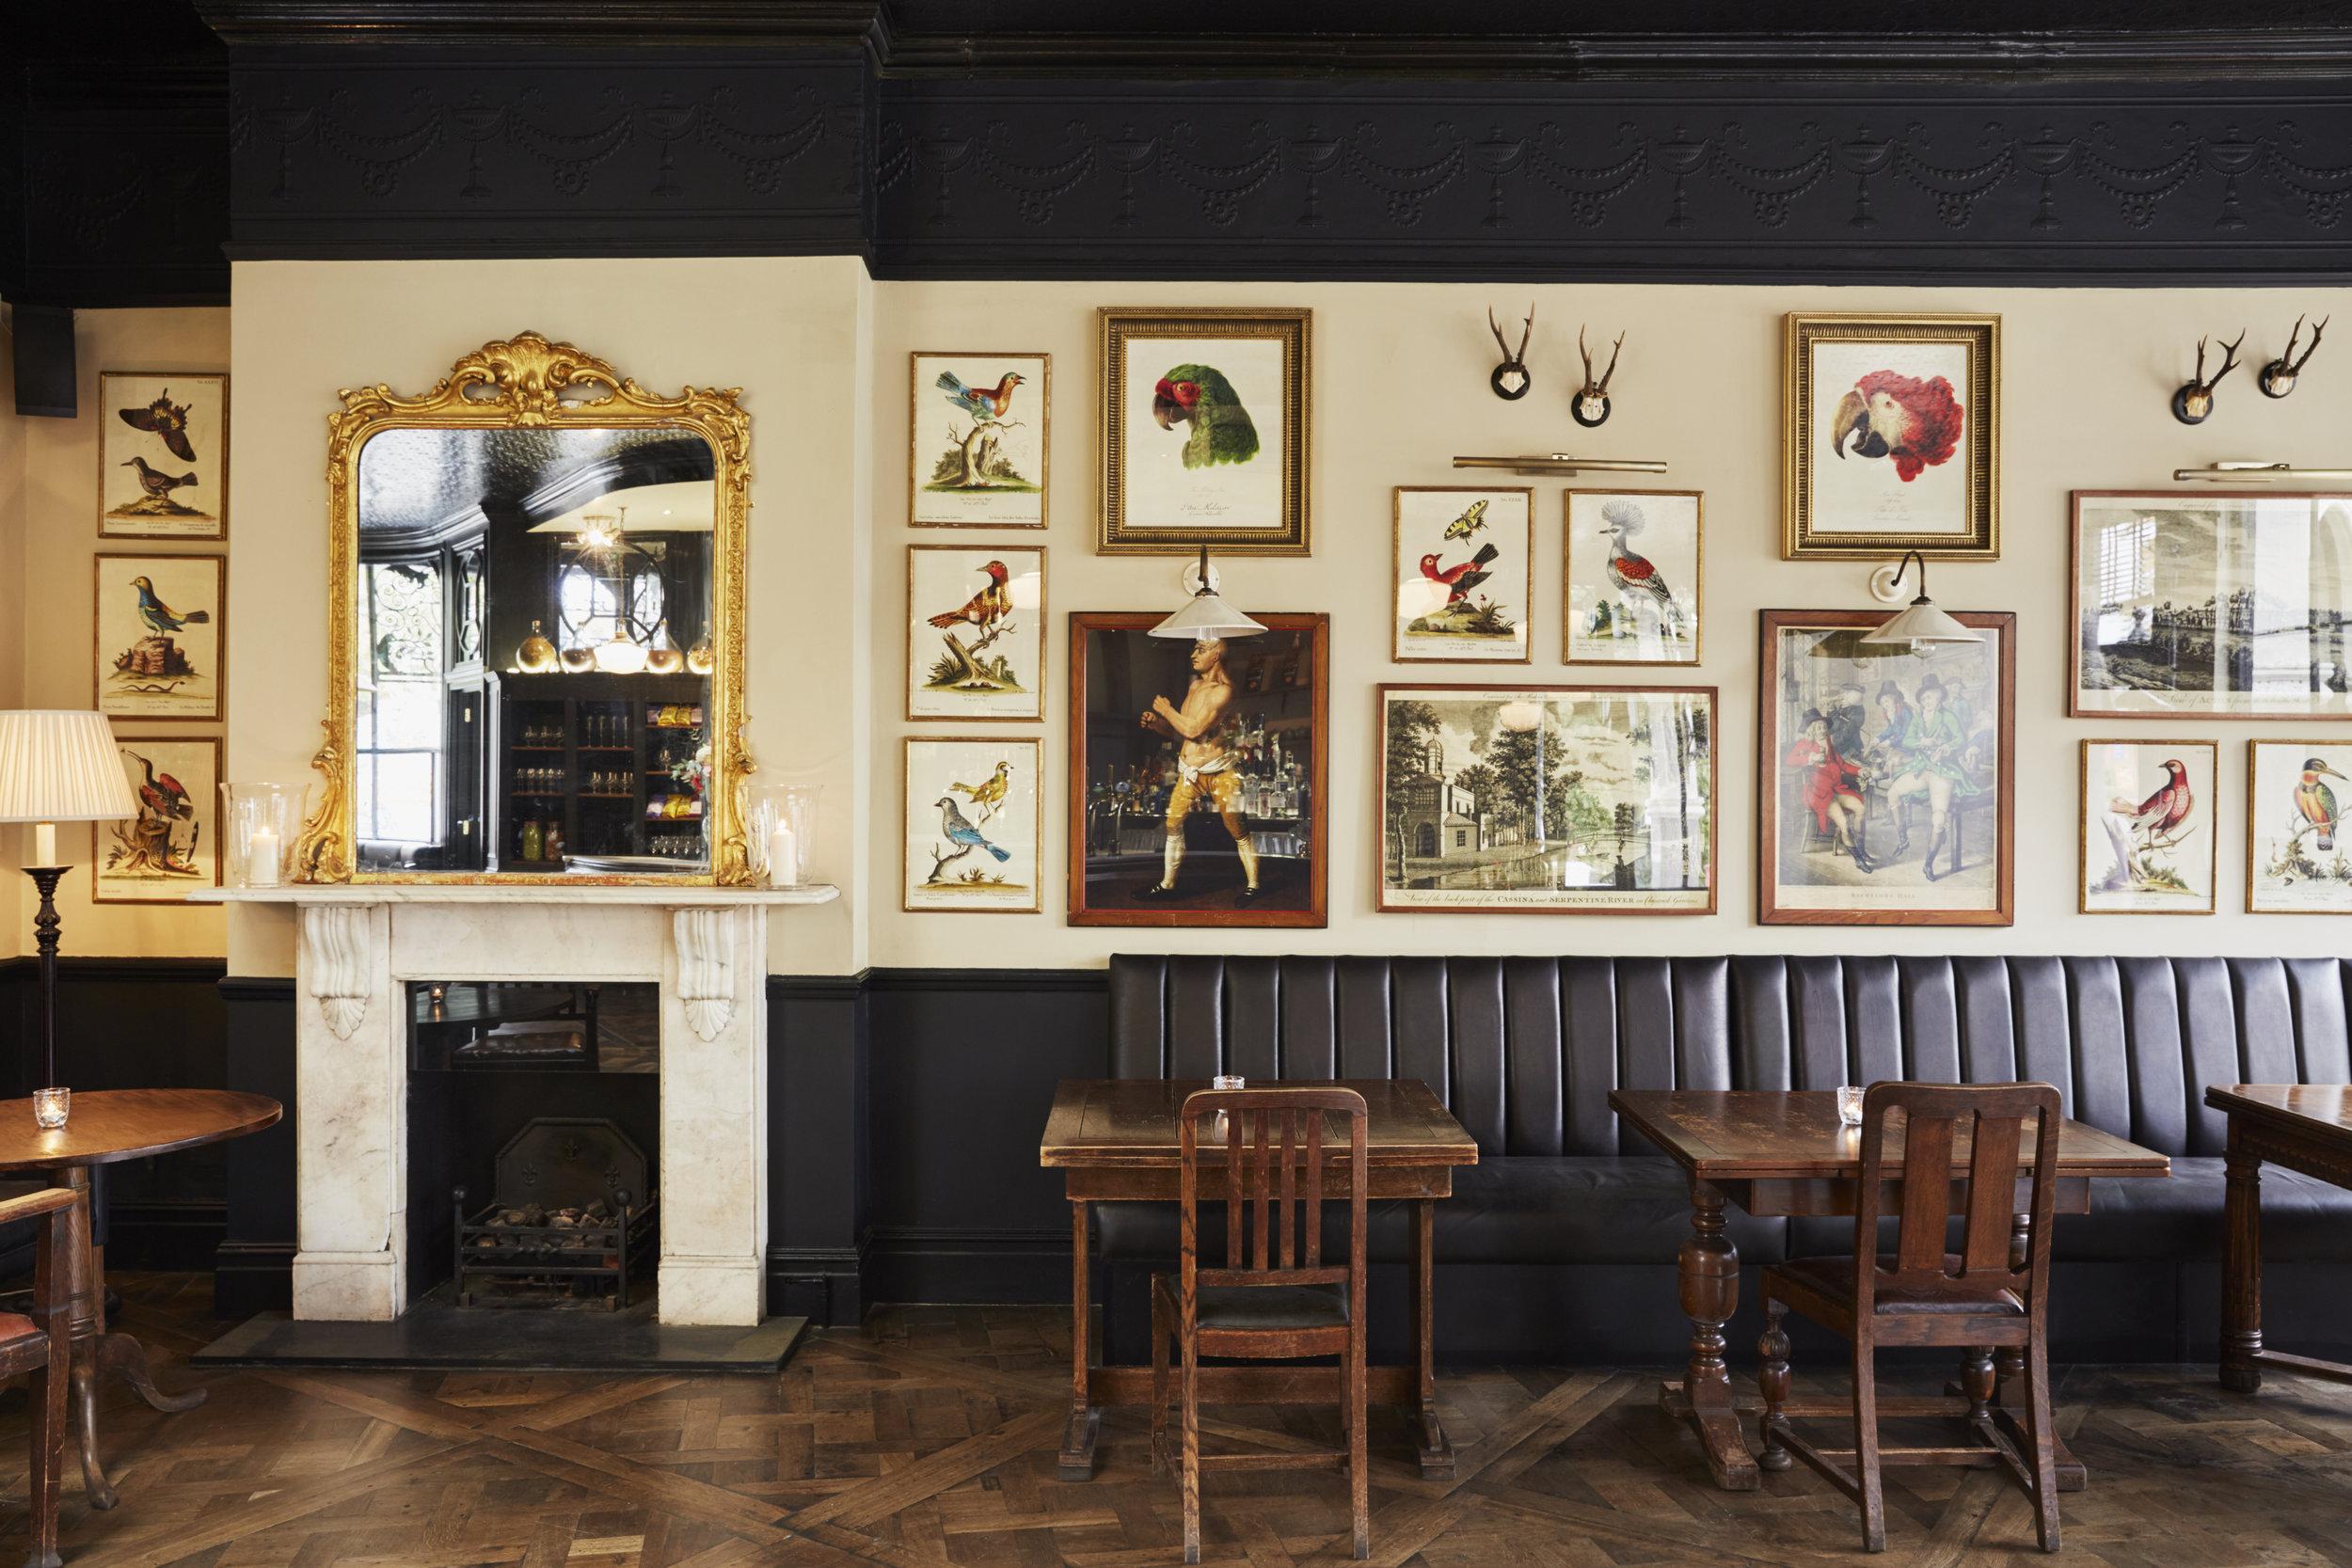 The-bar-at-The-Princess-Victoria-Shepherds-Bush-2.jpg